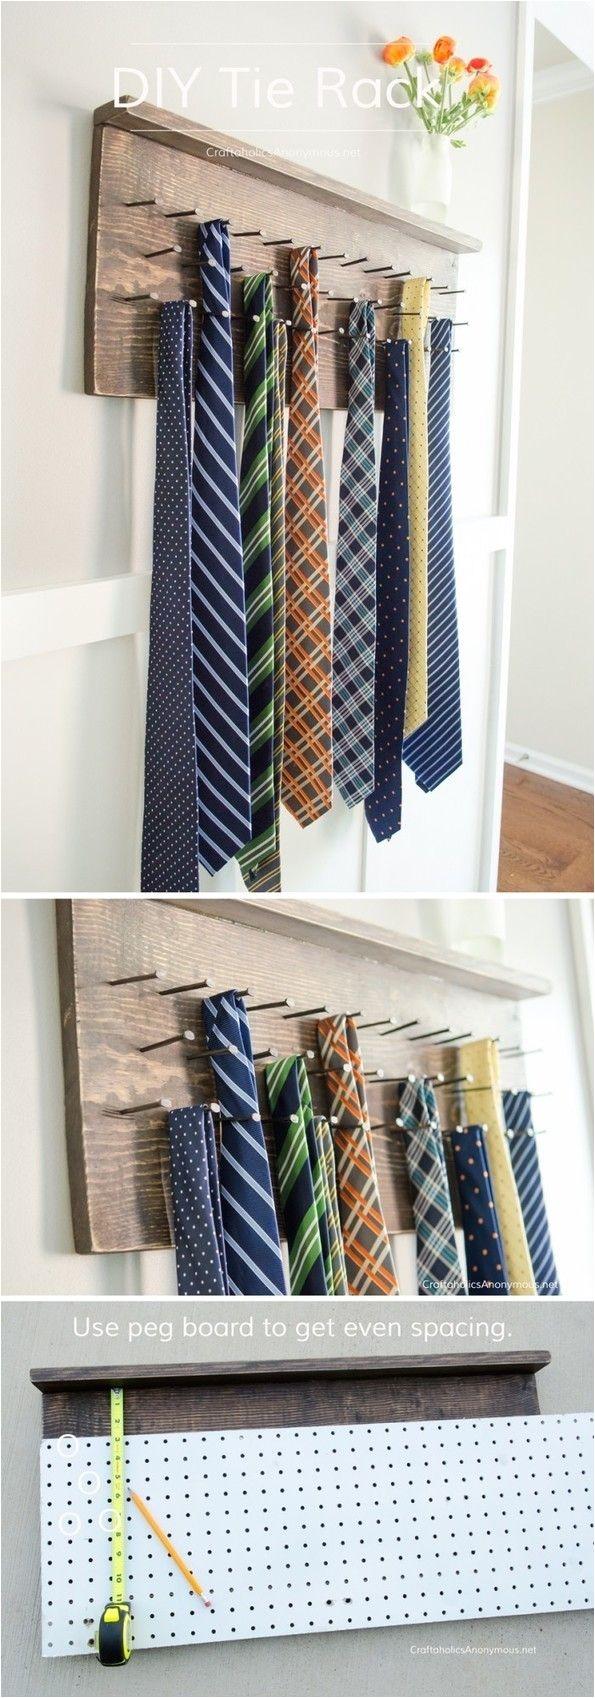 diy tie rack tutorial great idea for dad lumberprojects